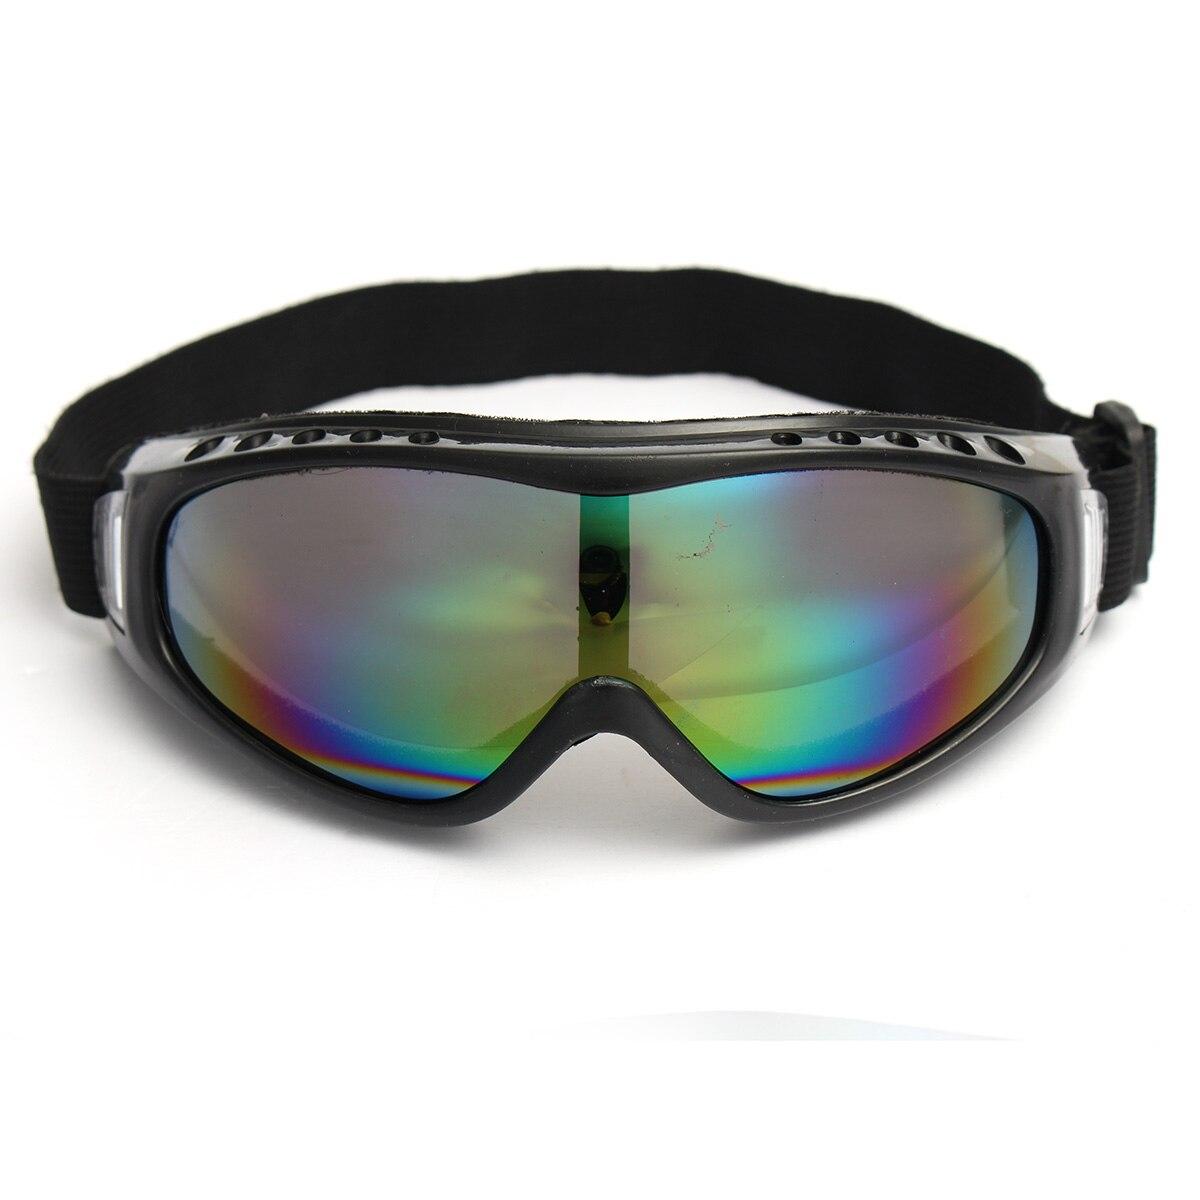 ski sunglasses  Online Get Cheap Ski Sunglasses -Aliexpress.com